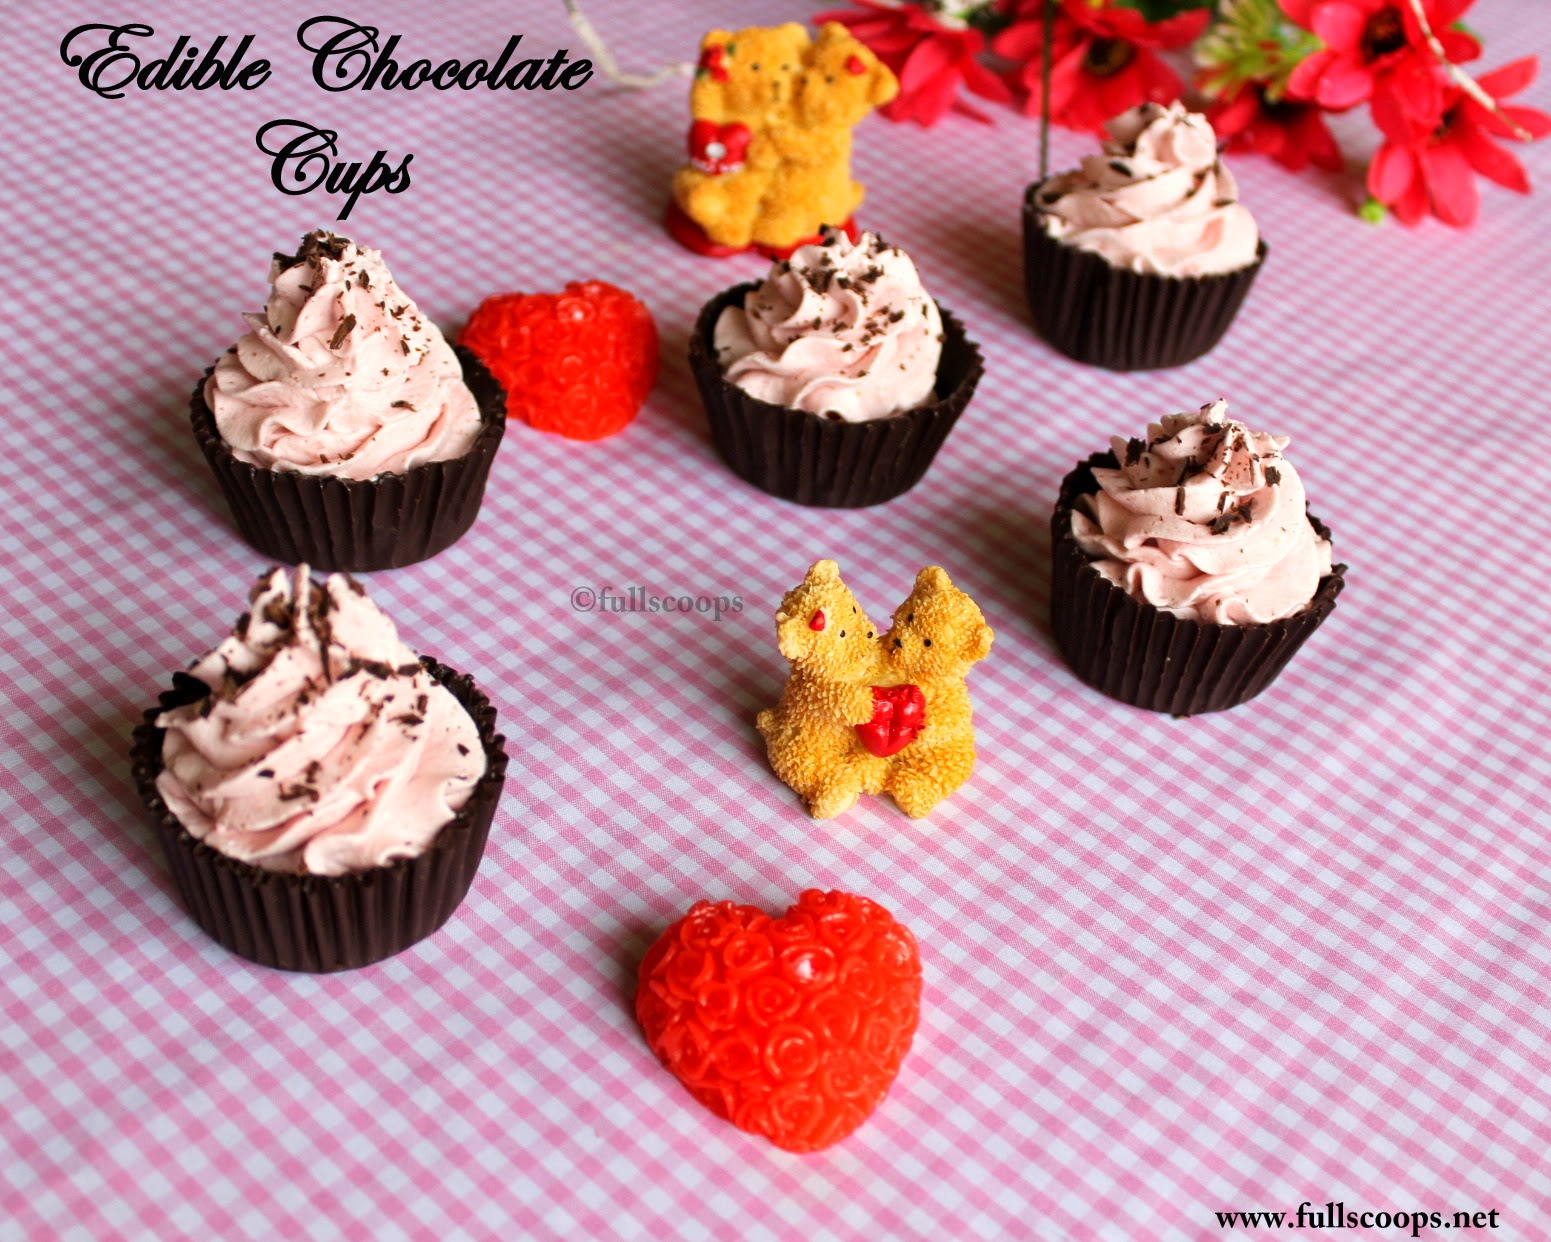 Dark Chocolate Filled Cupcakes